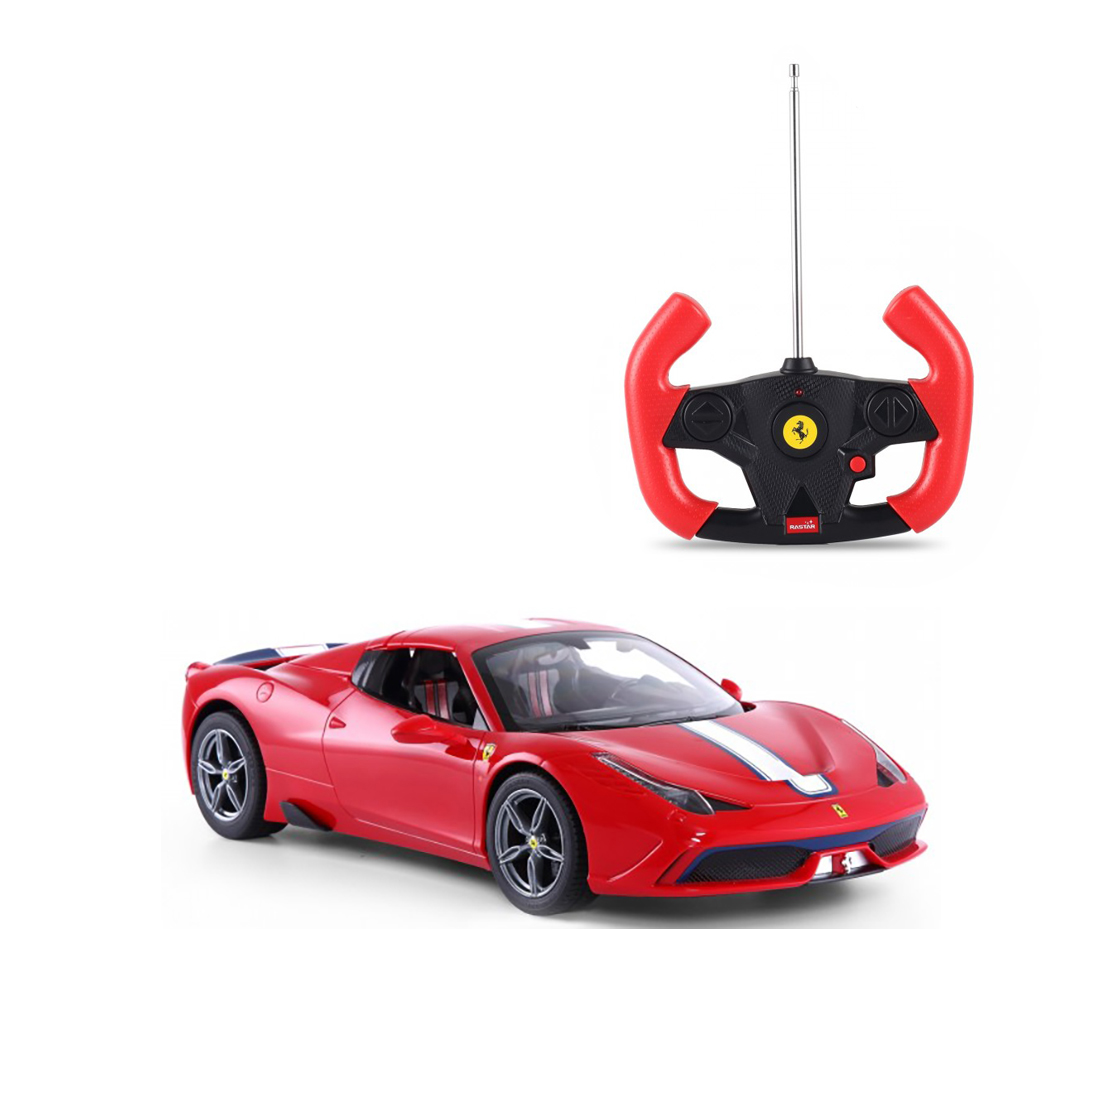 Masinuta cu telecomanda Rastar Ferrari 458 Convertible, Rosu